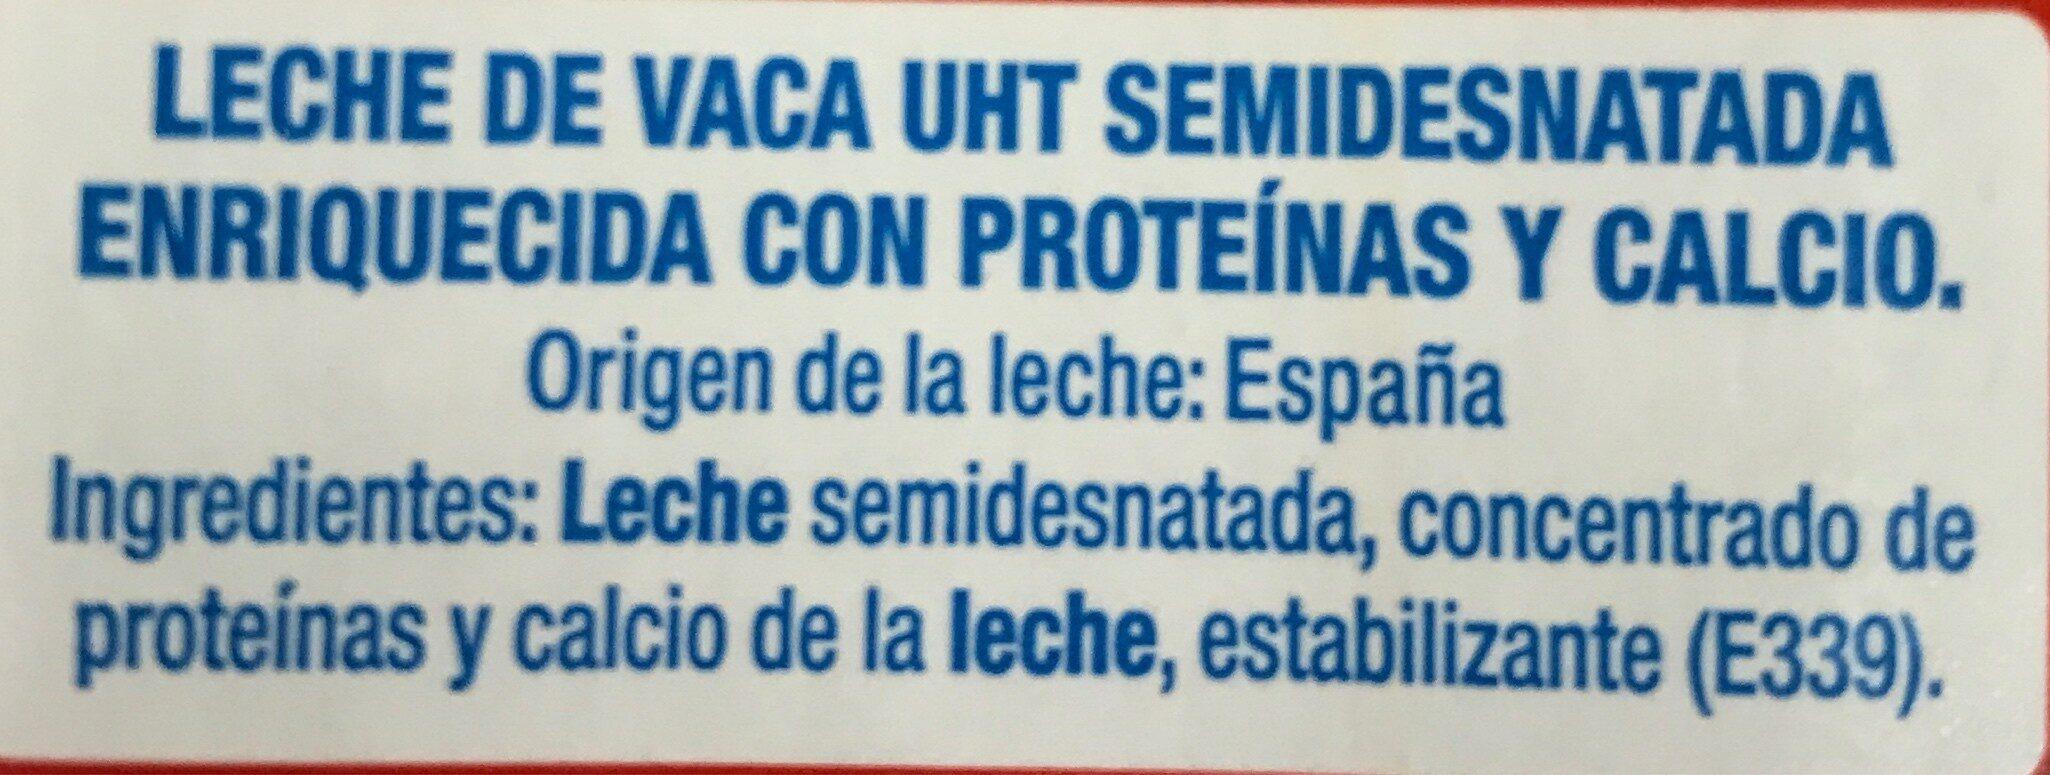 Leche semidesnatada +proteinas - Ingrédients - fr